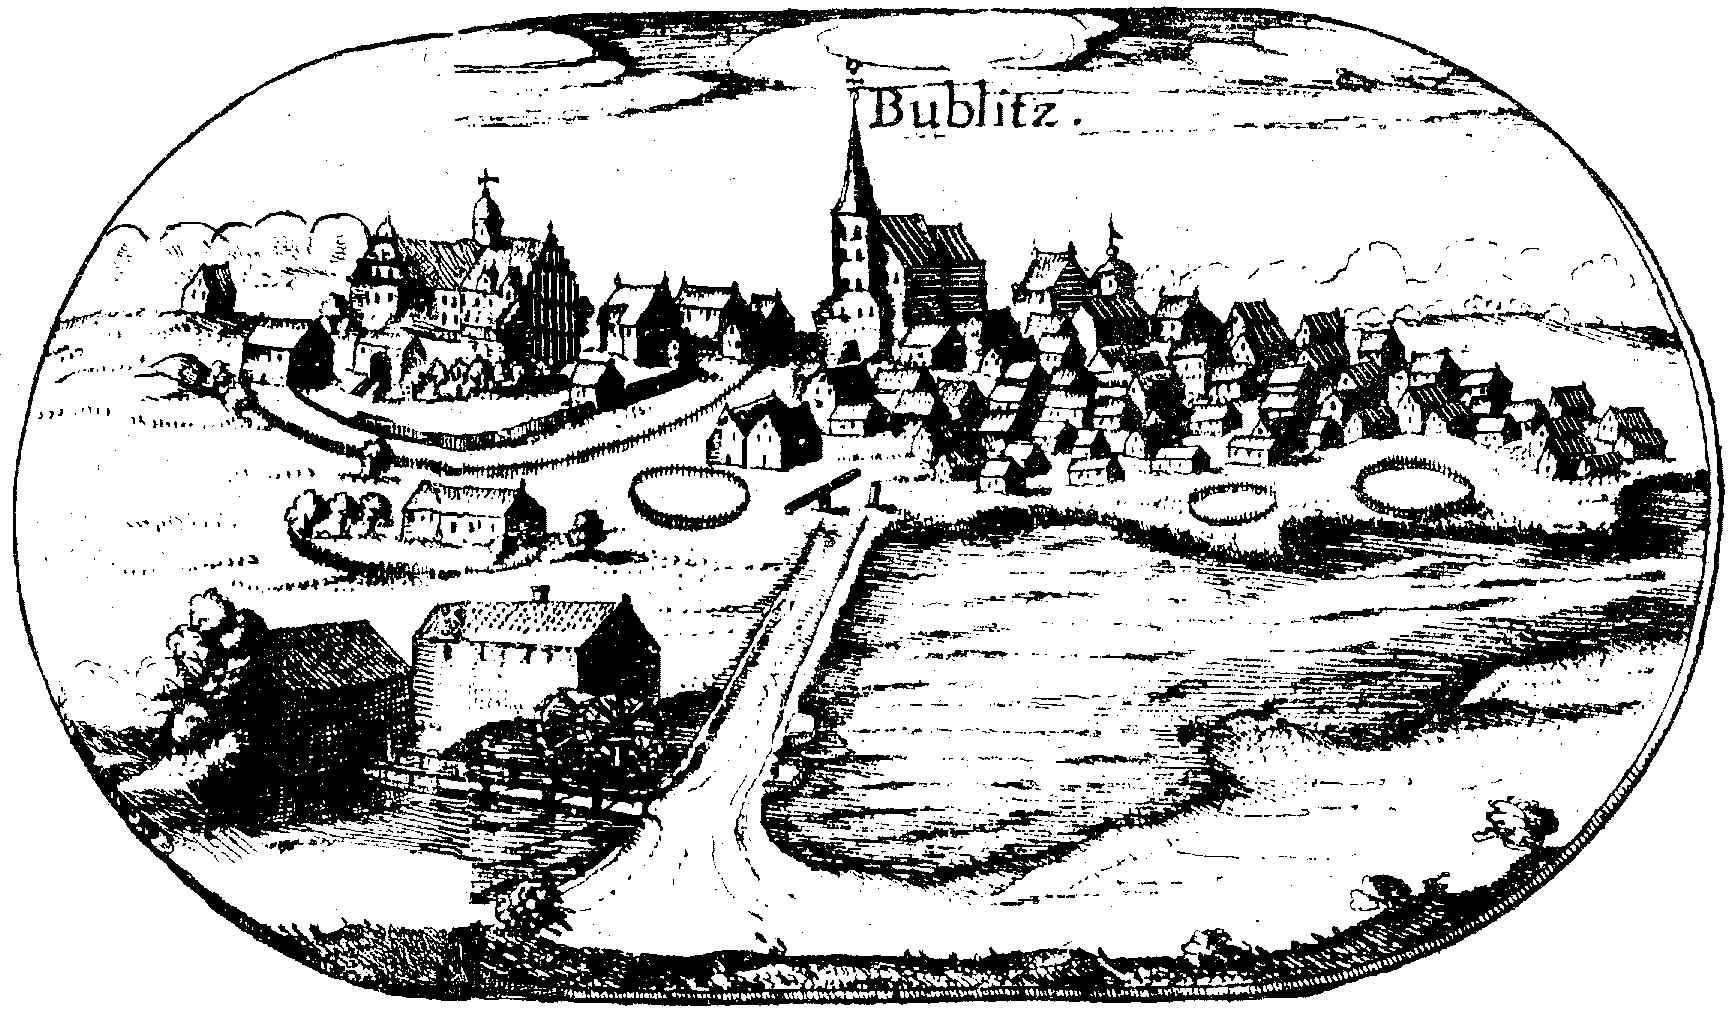 Lubinus Bublitz.png